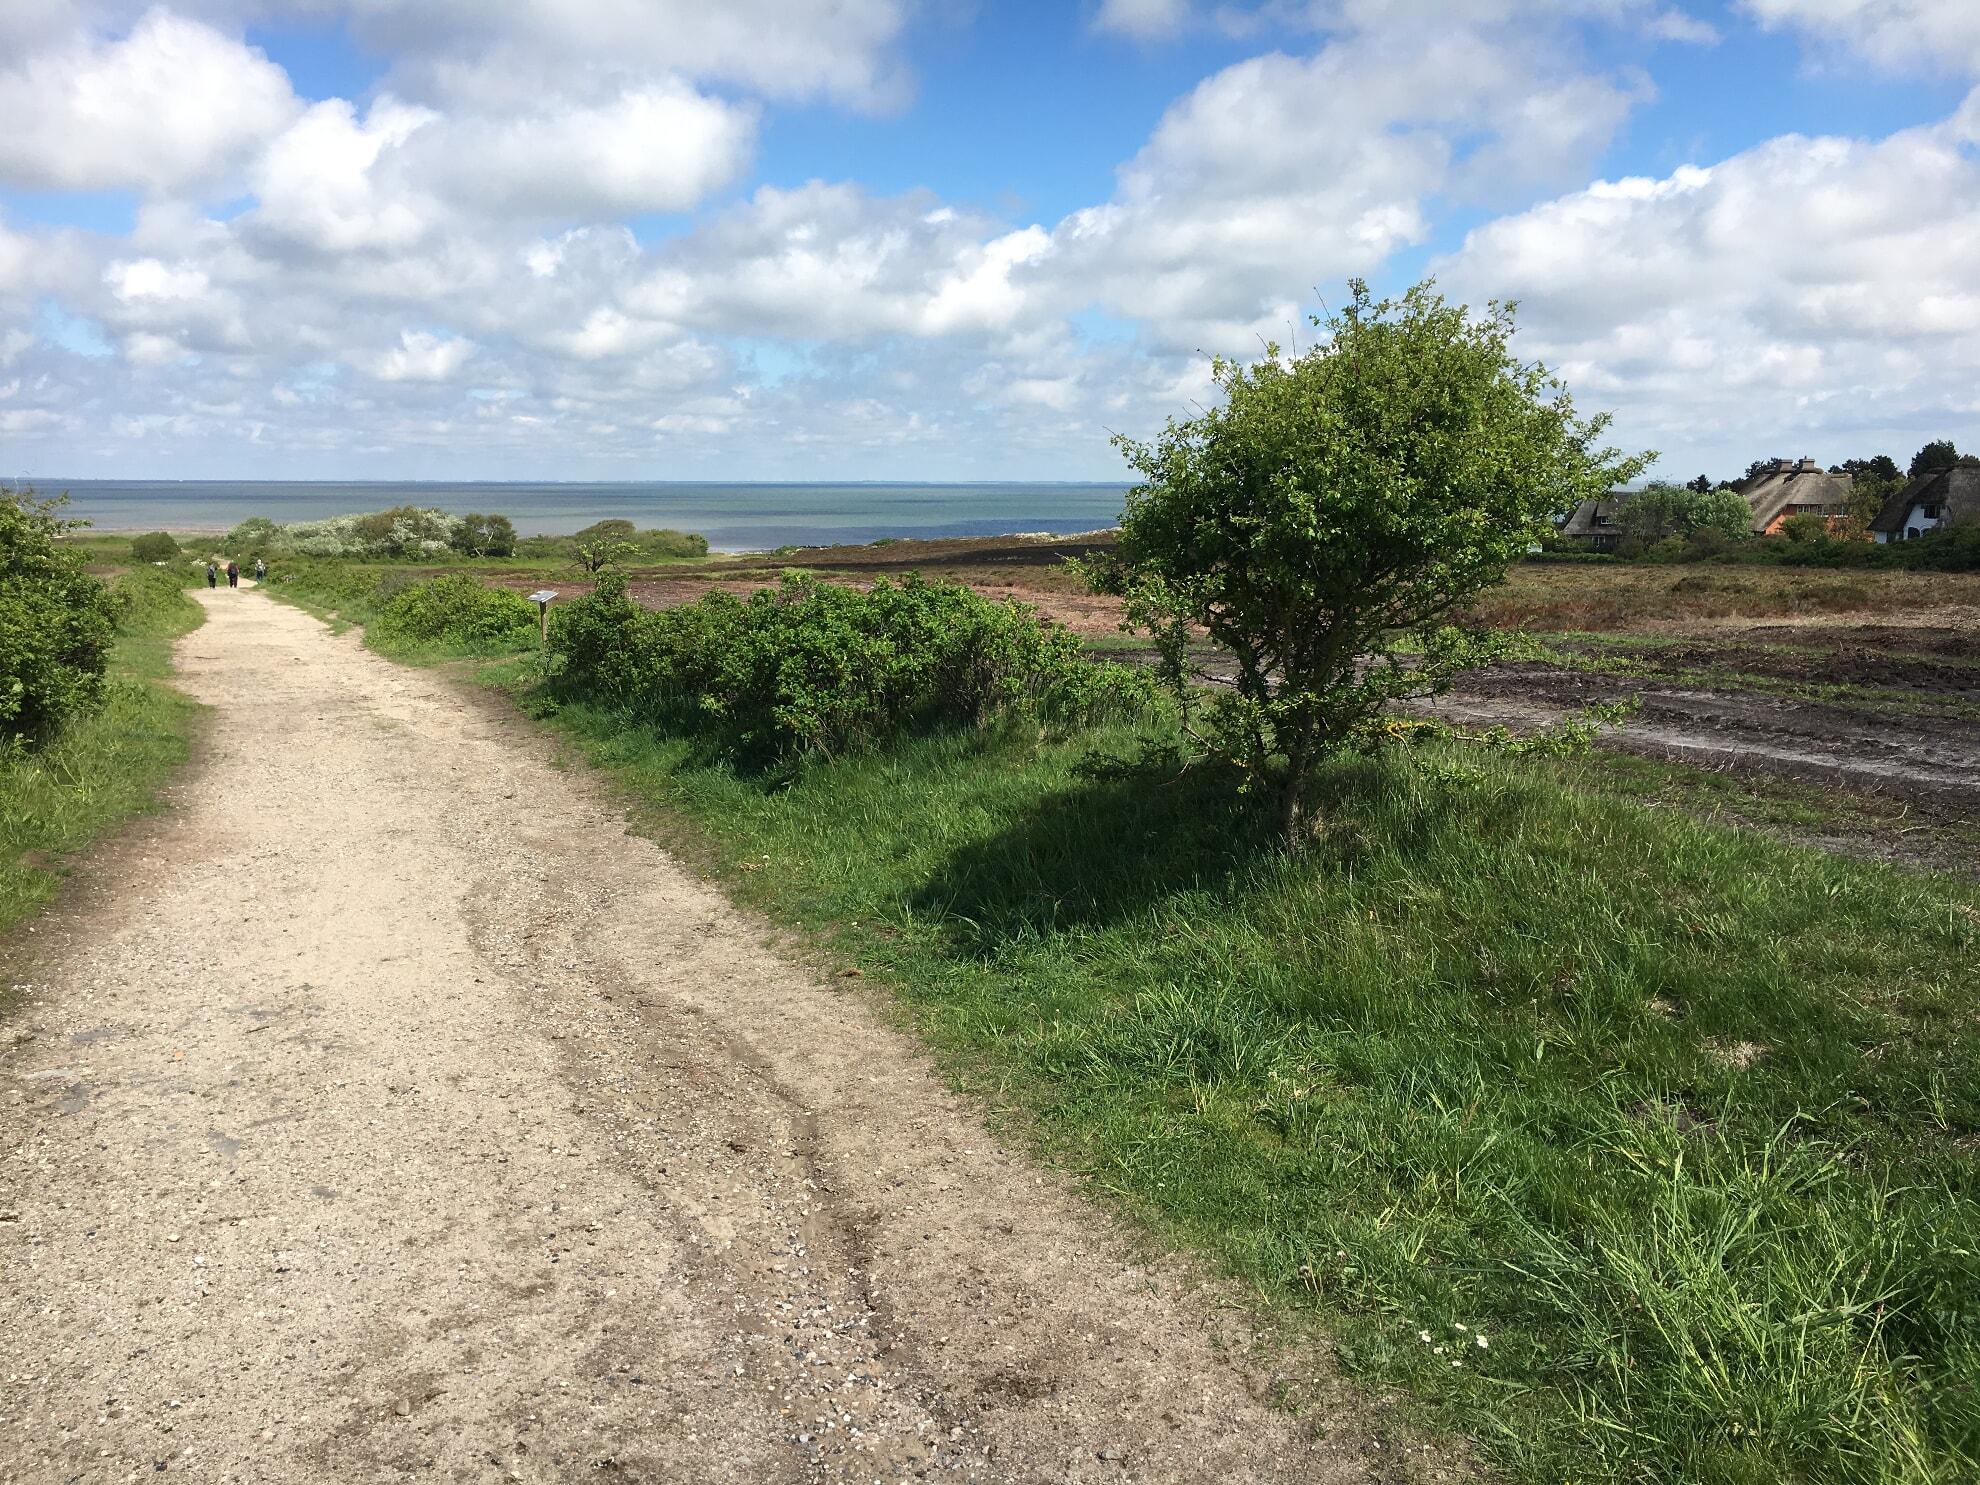 Braderuper Heide